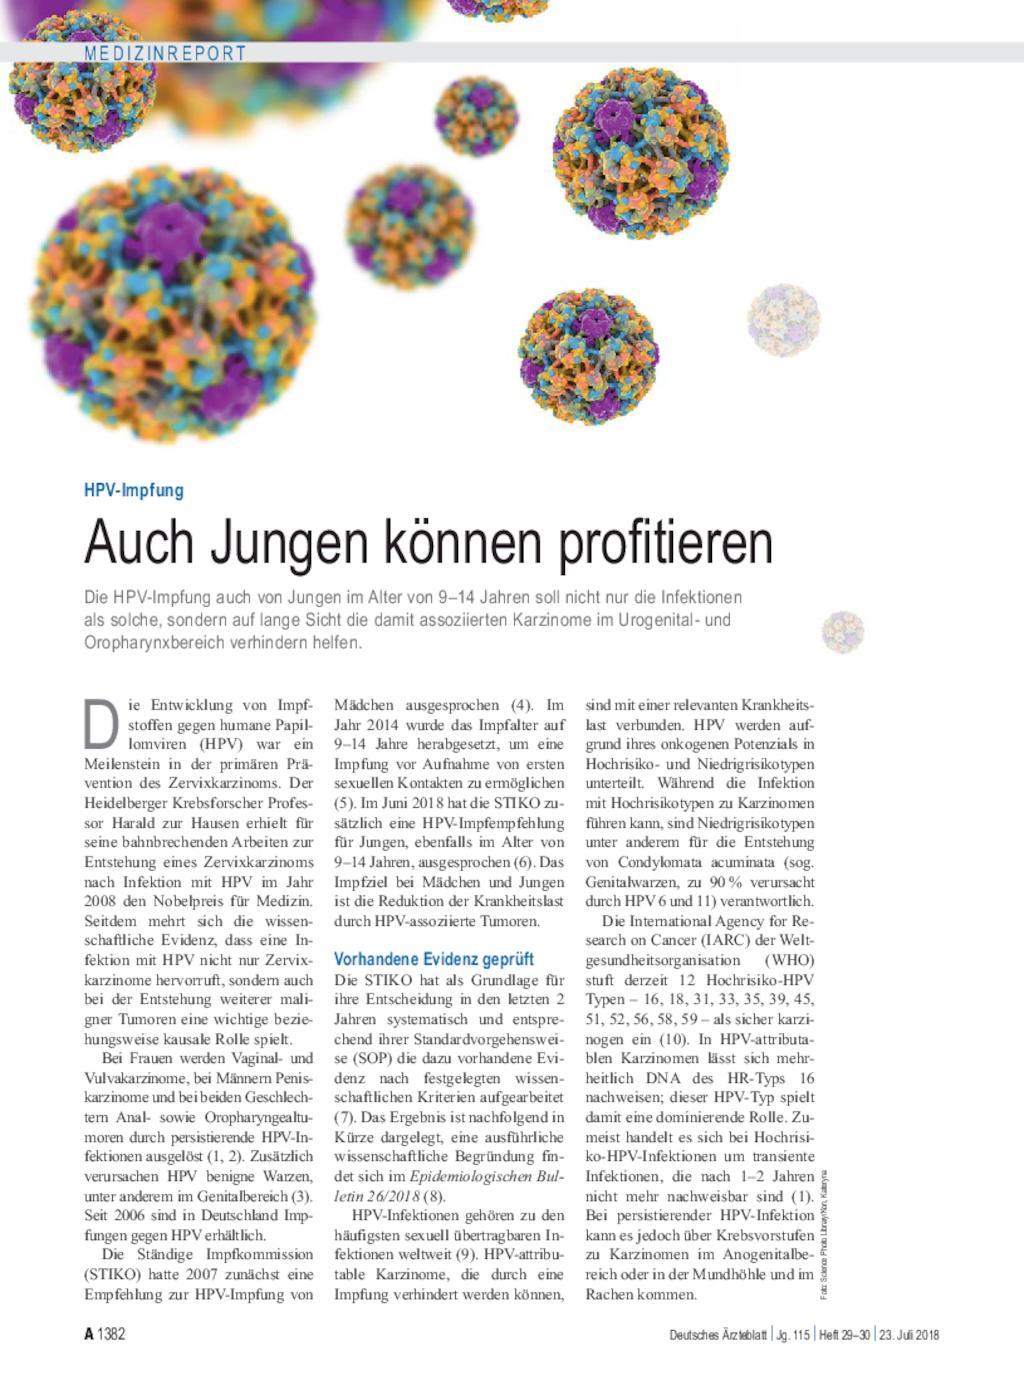 HPV-IMPFUNG - Definiția și sinonimele HPV-Impfung în dicționarul Germană